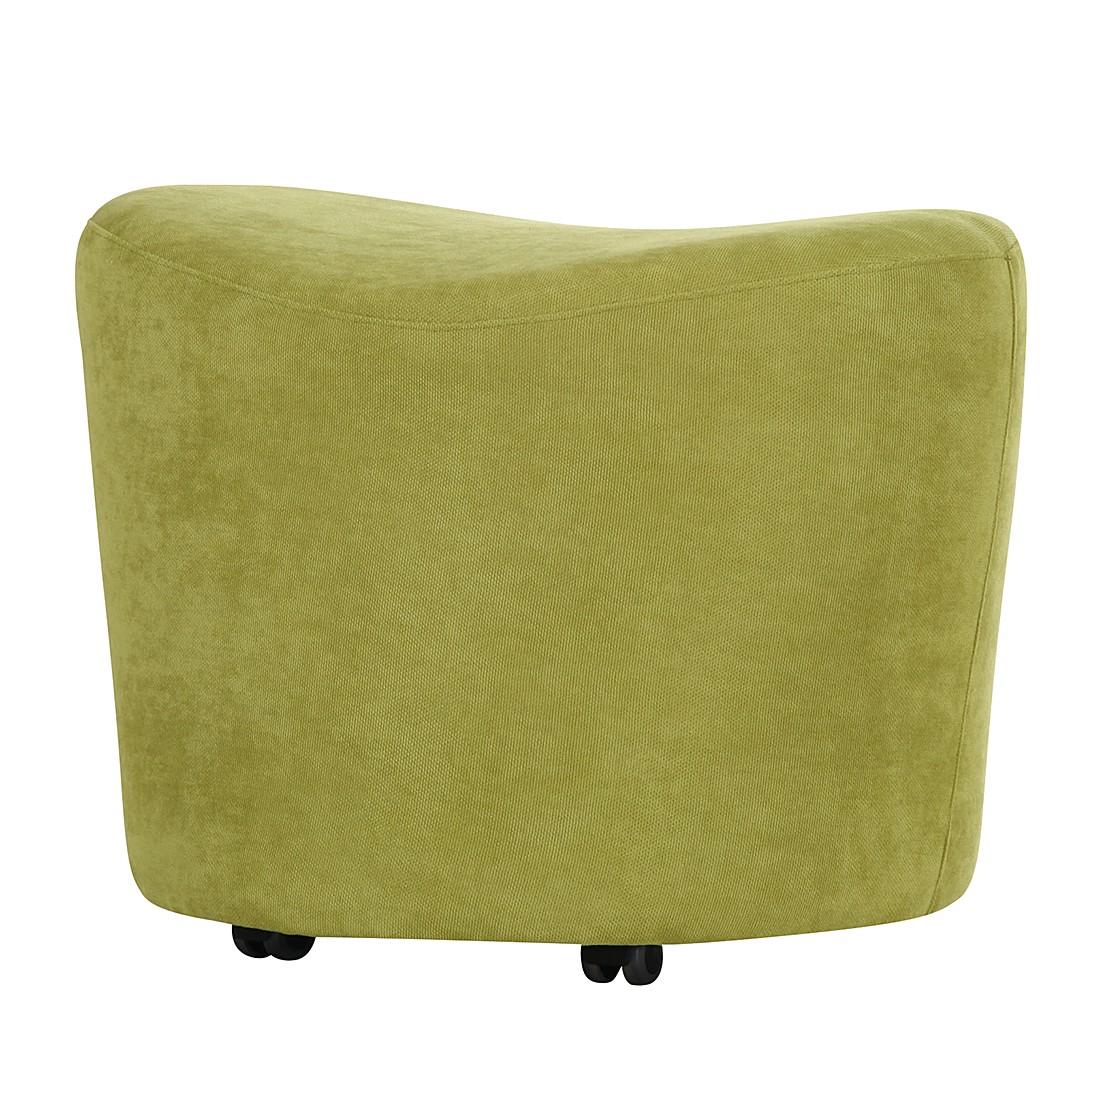 Hocker Kenai – Webstoff Grün, roomscape jetzt bestellen